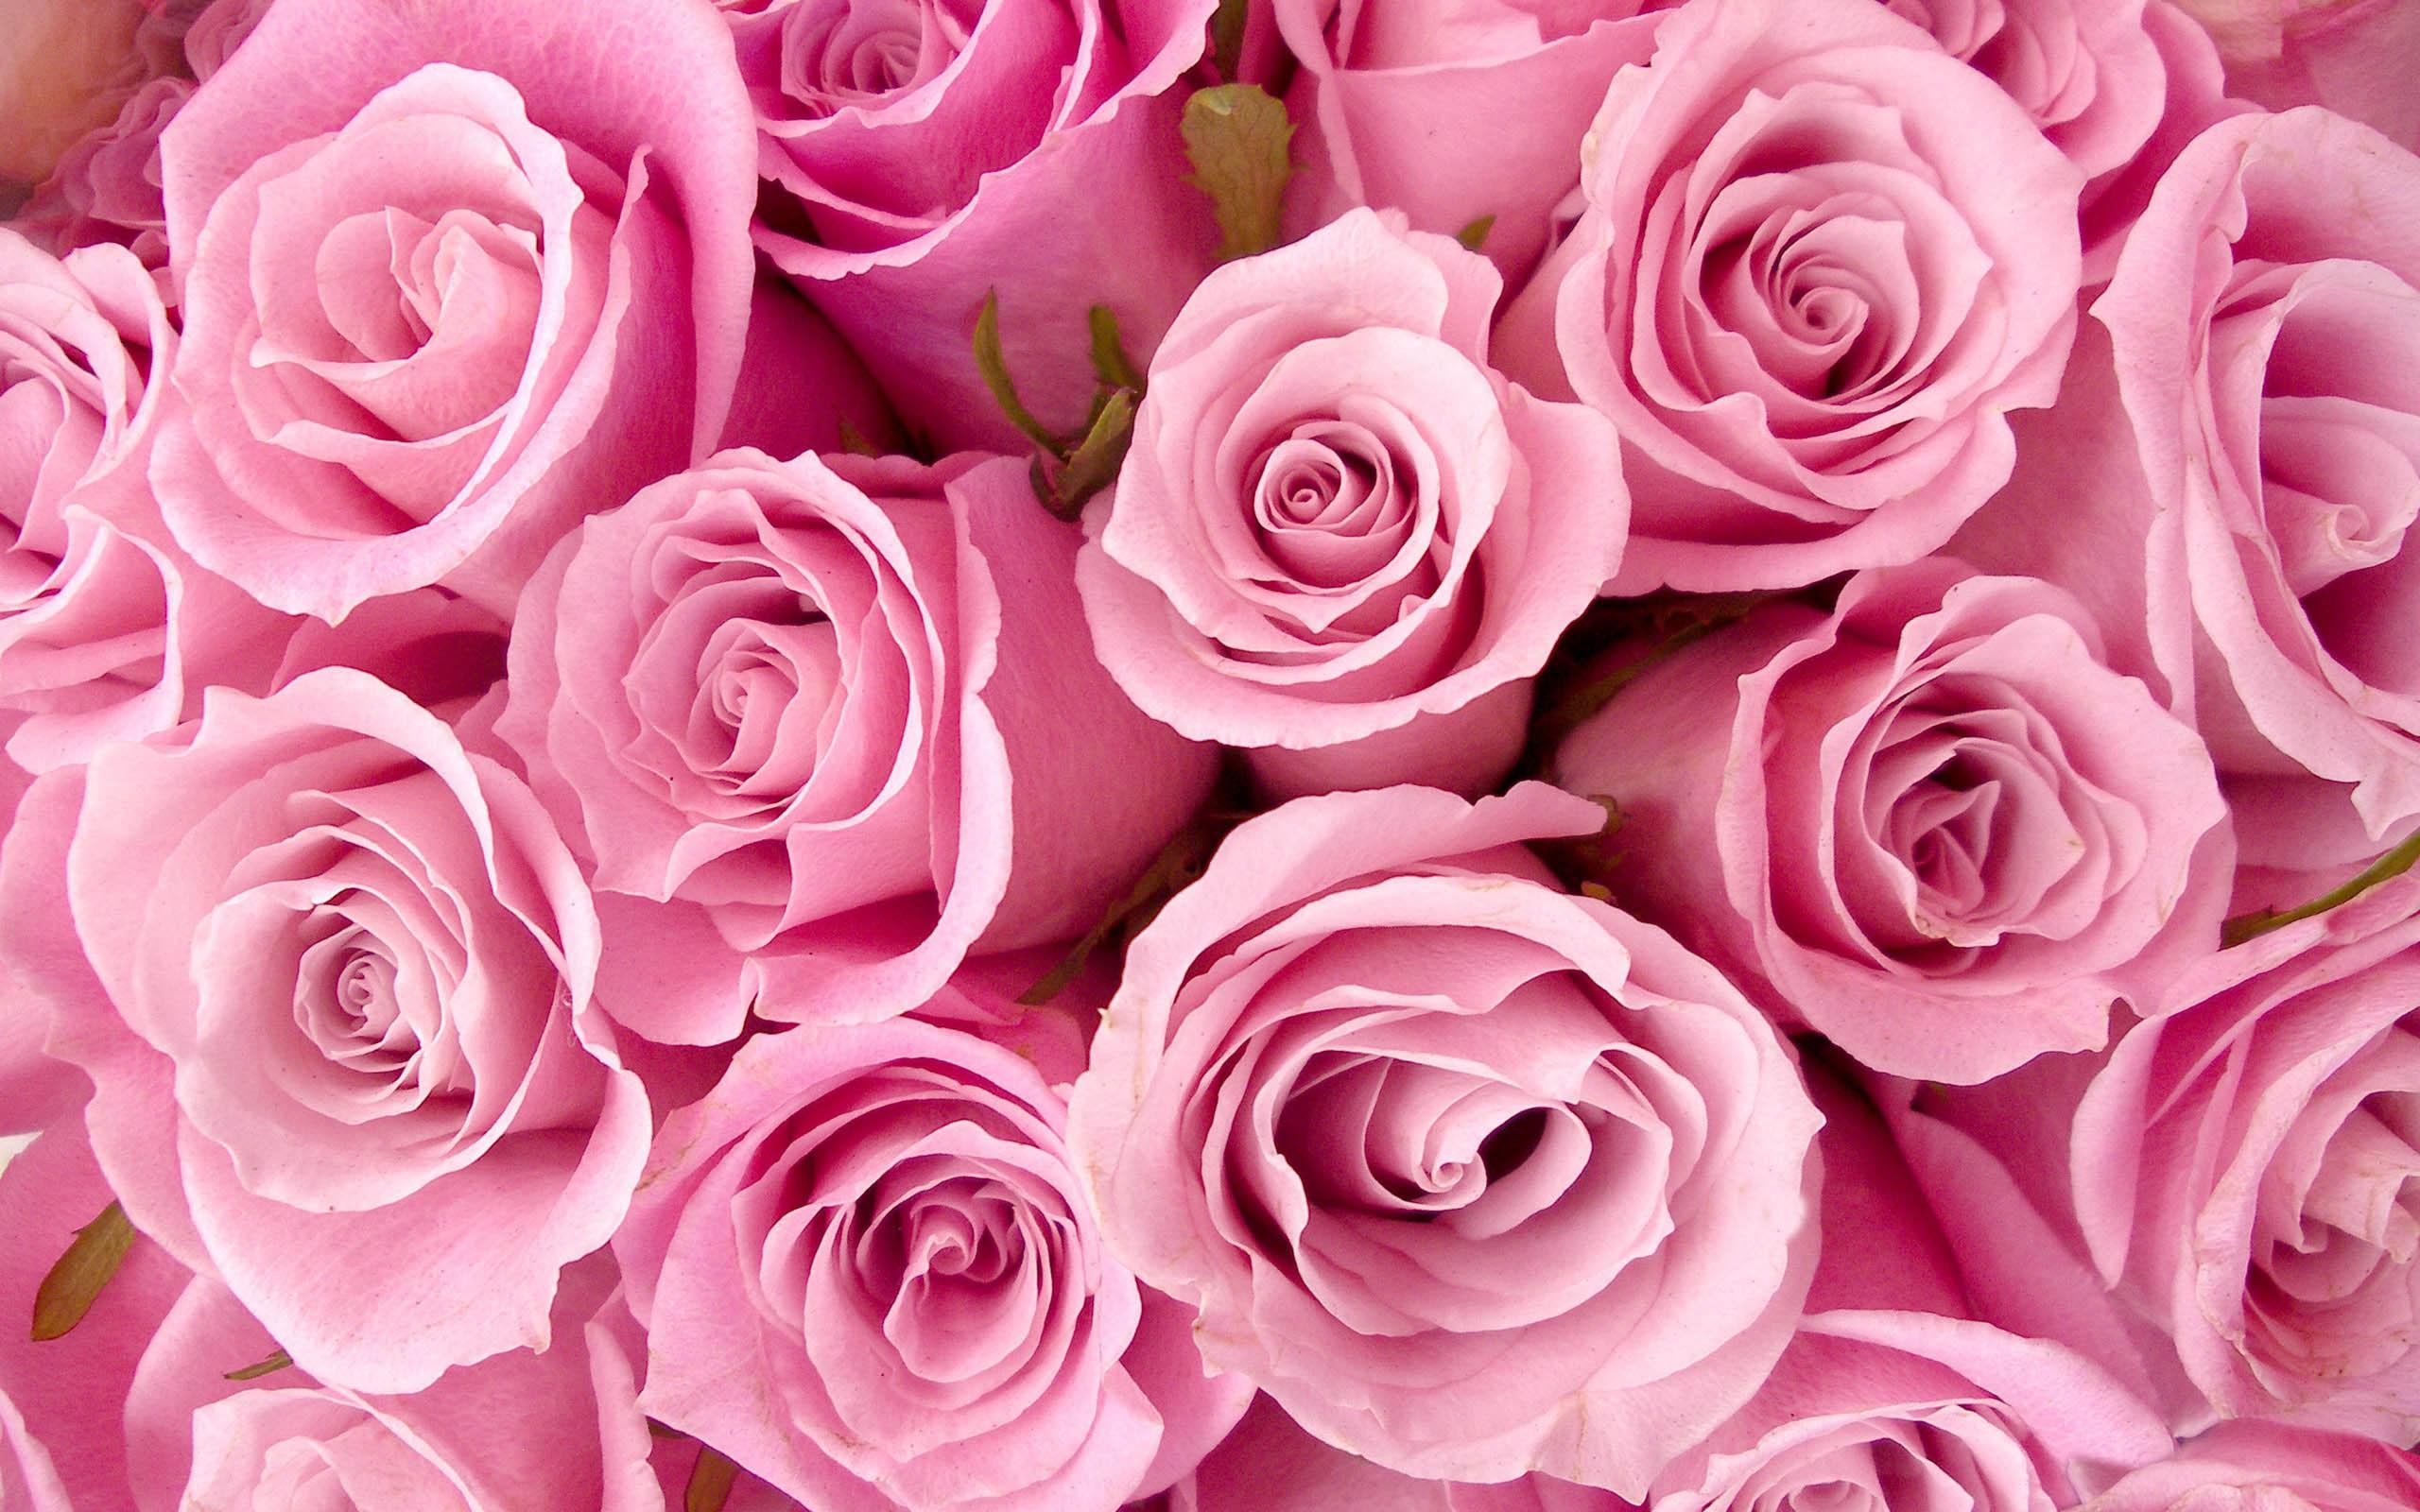 Special Pink Roses Wallpaper Desktop For Desktop 2560x1600